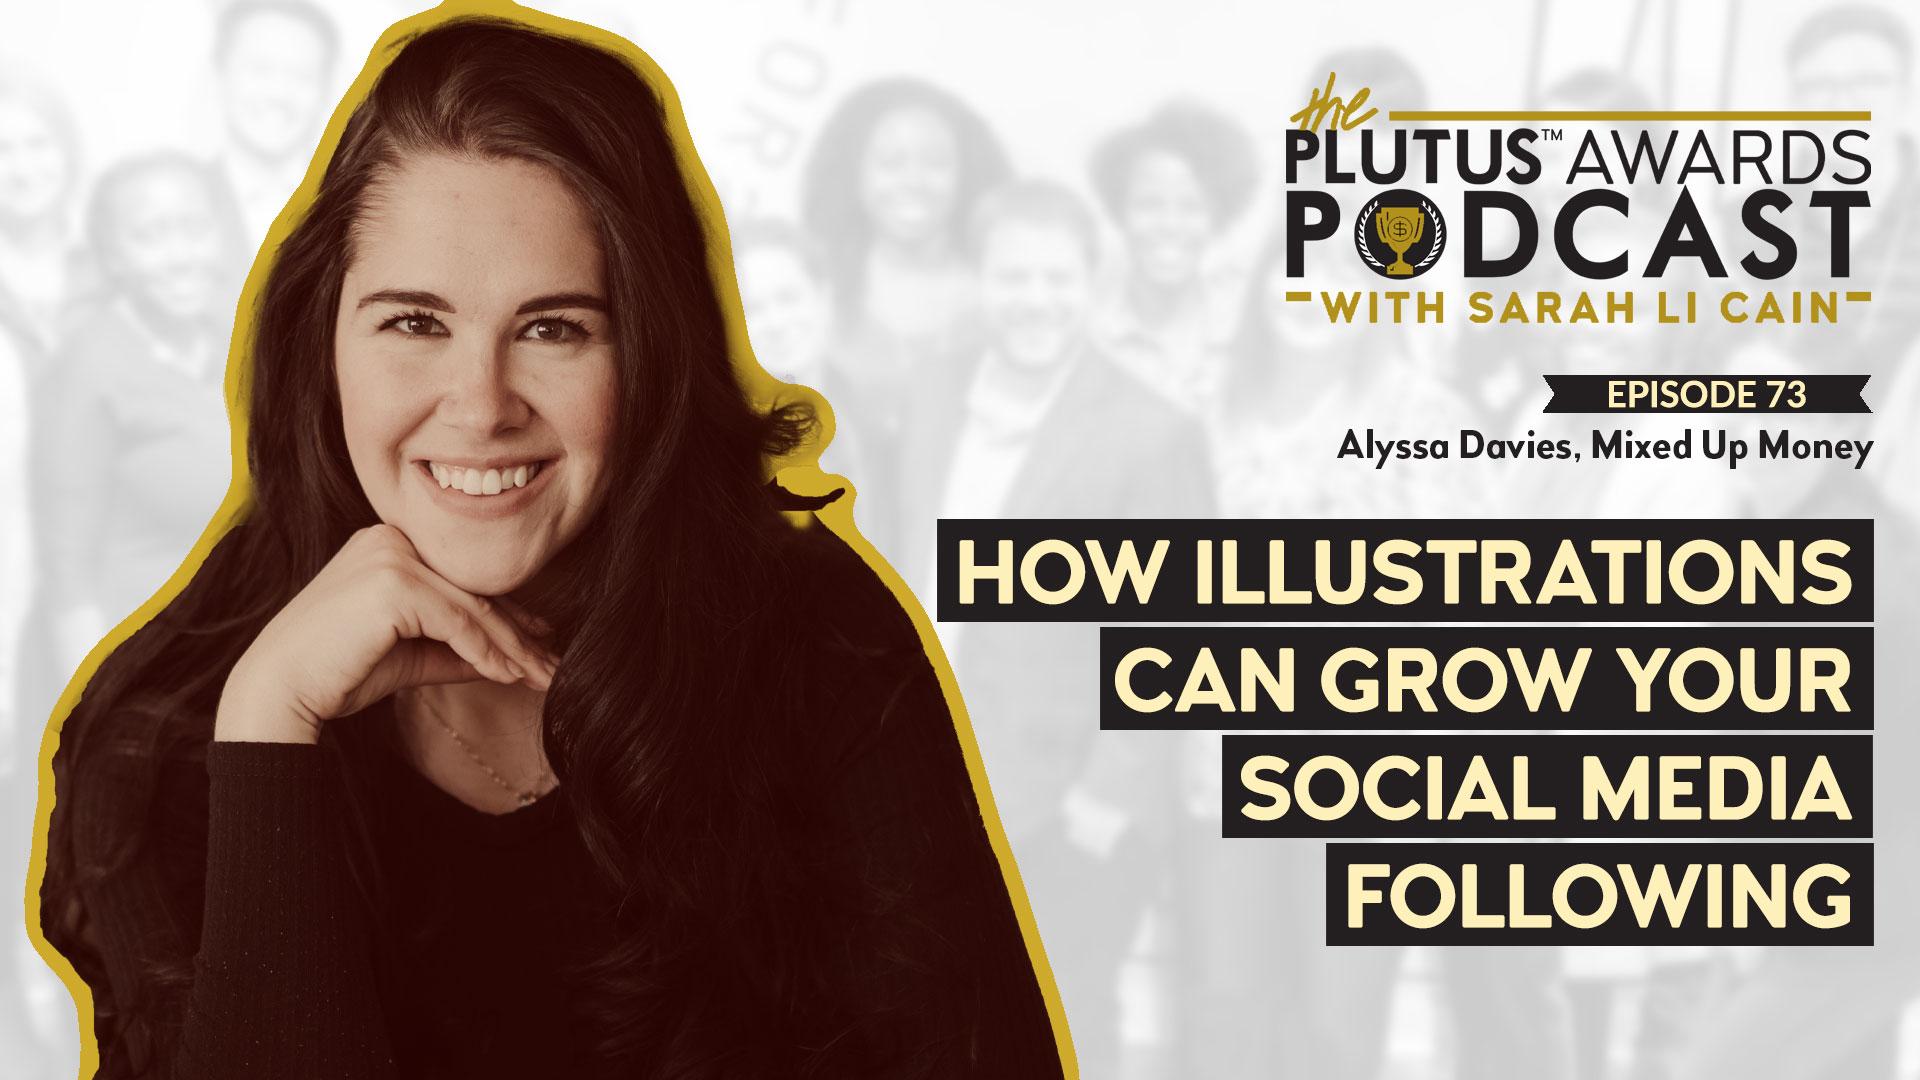 Plutus Awards Podcast - Alyssa Davies Featured Image